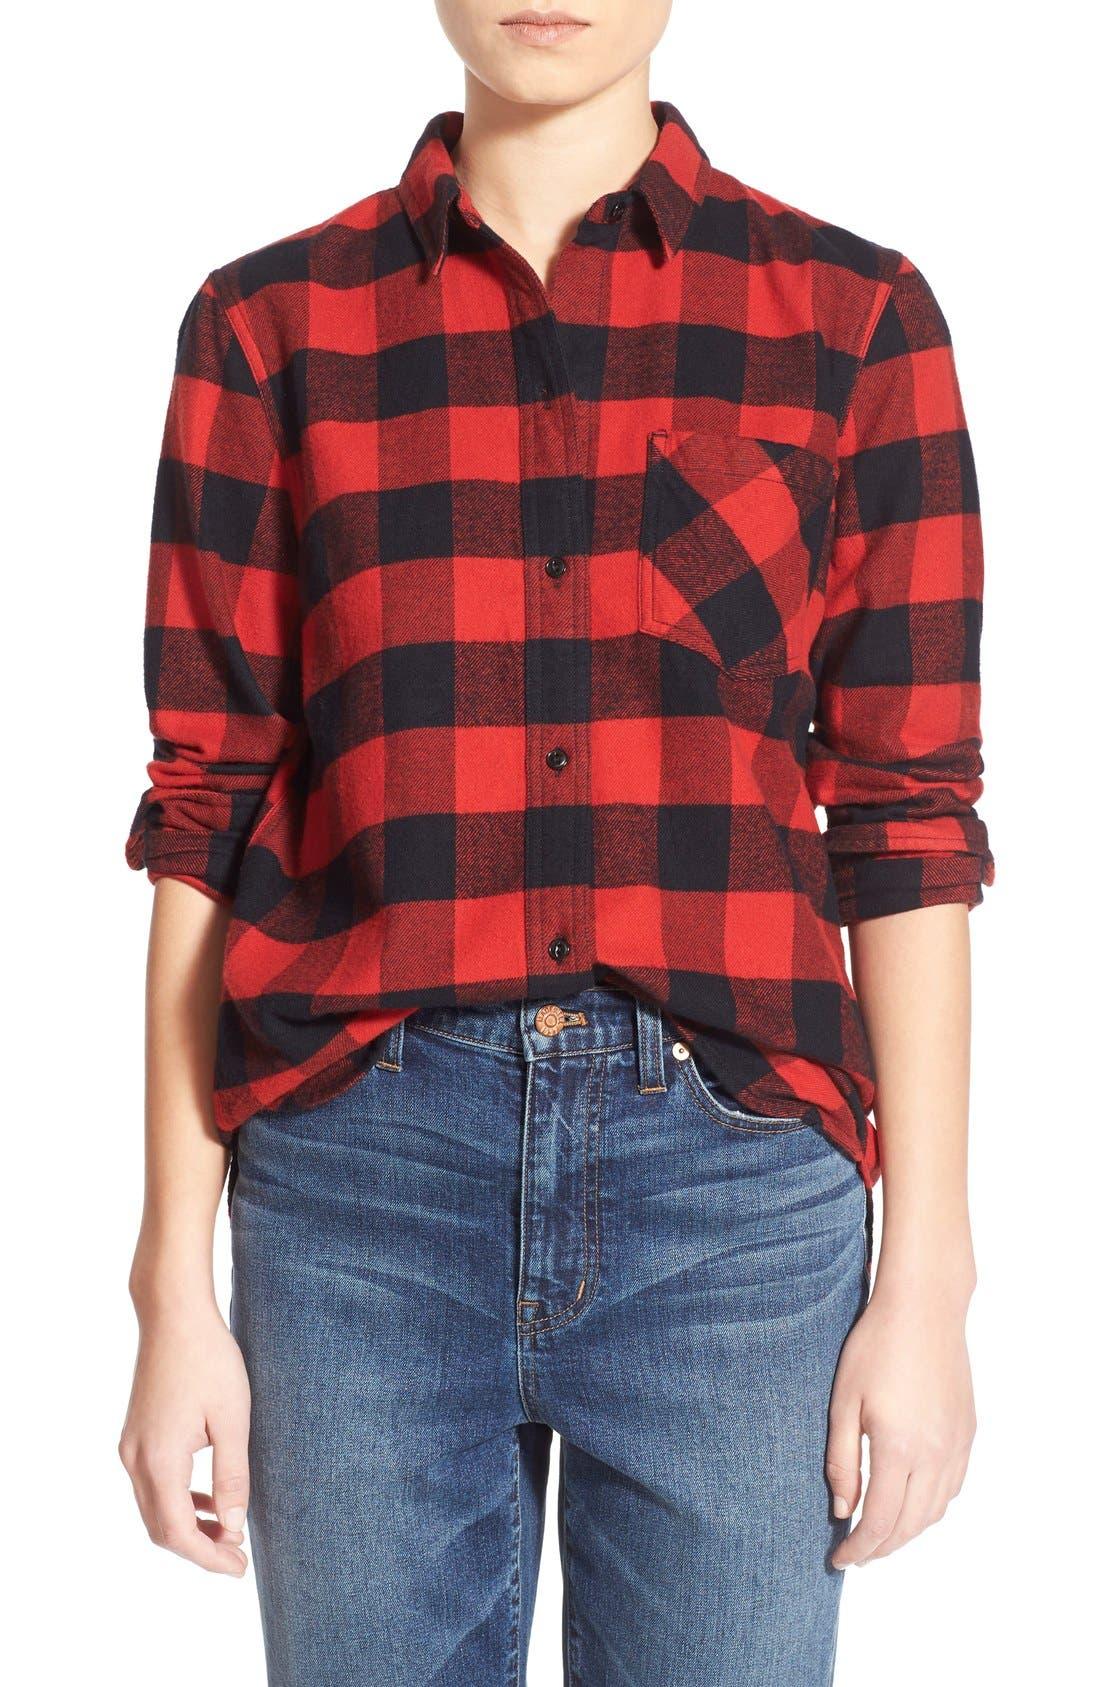 Main Image - Madewell 'Ex Boyfriend' Buffalo Check Shirt